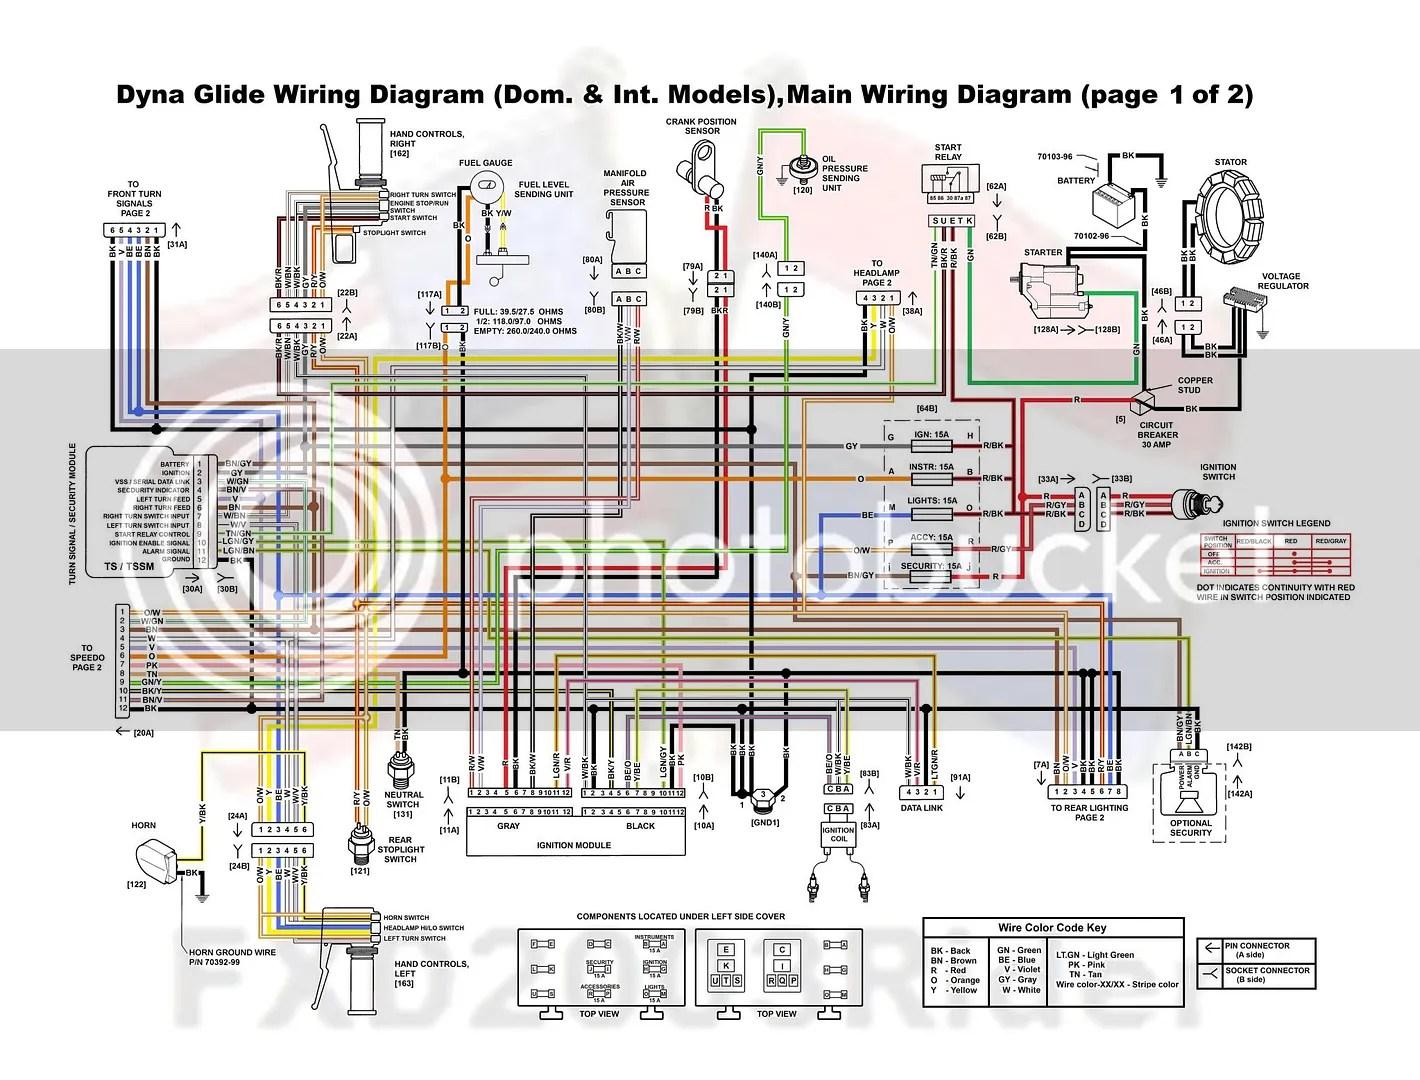 2014 harley wiring diagram share circuit diagrams harley tail light wiring diagram [ 1420 x 1080 Pixel ]